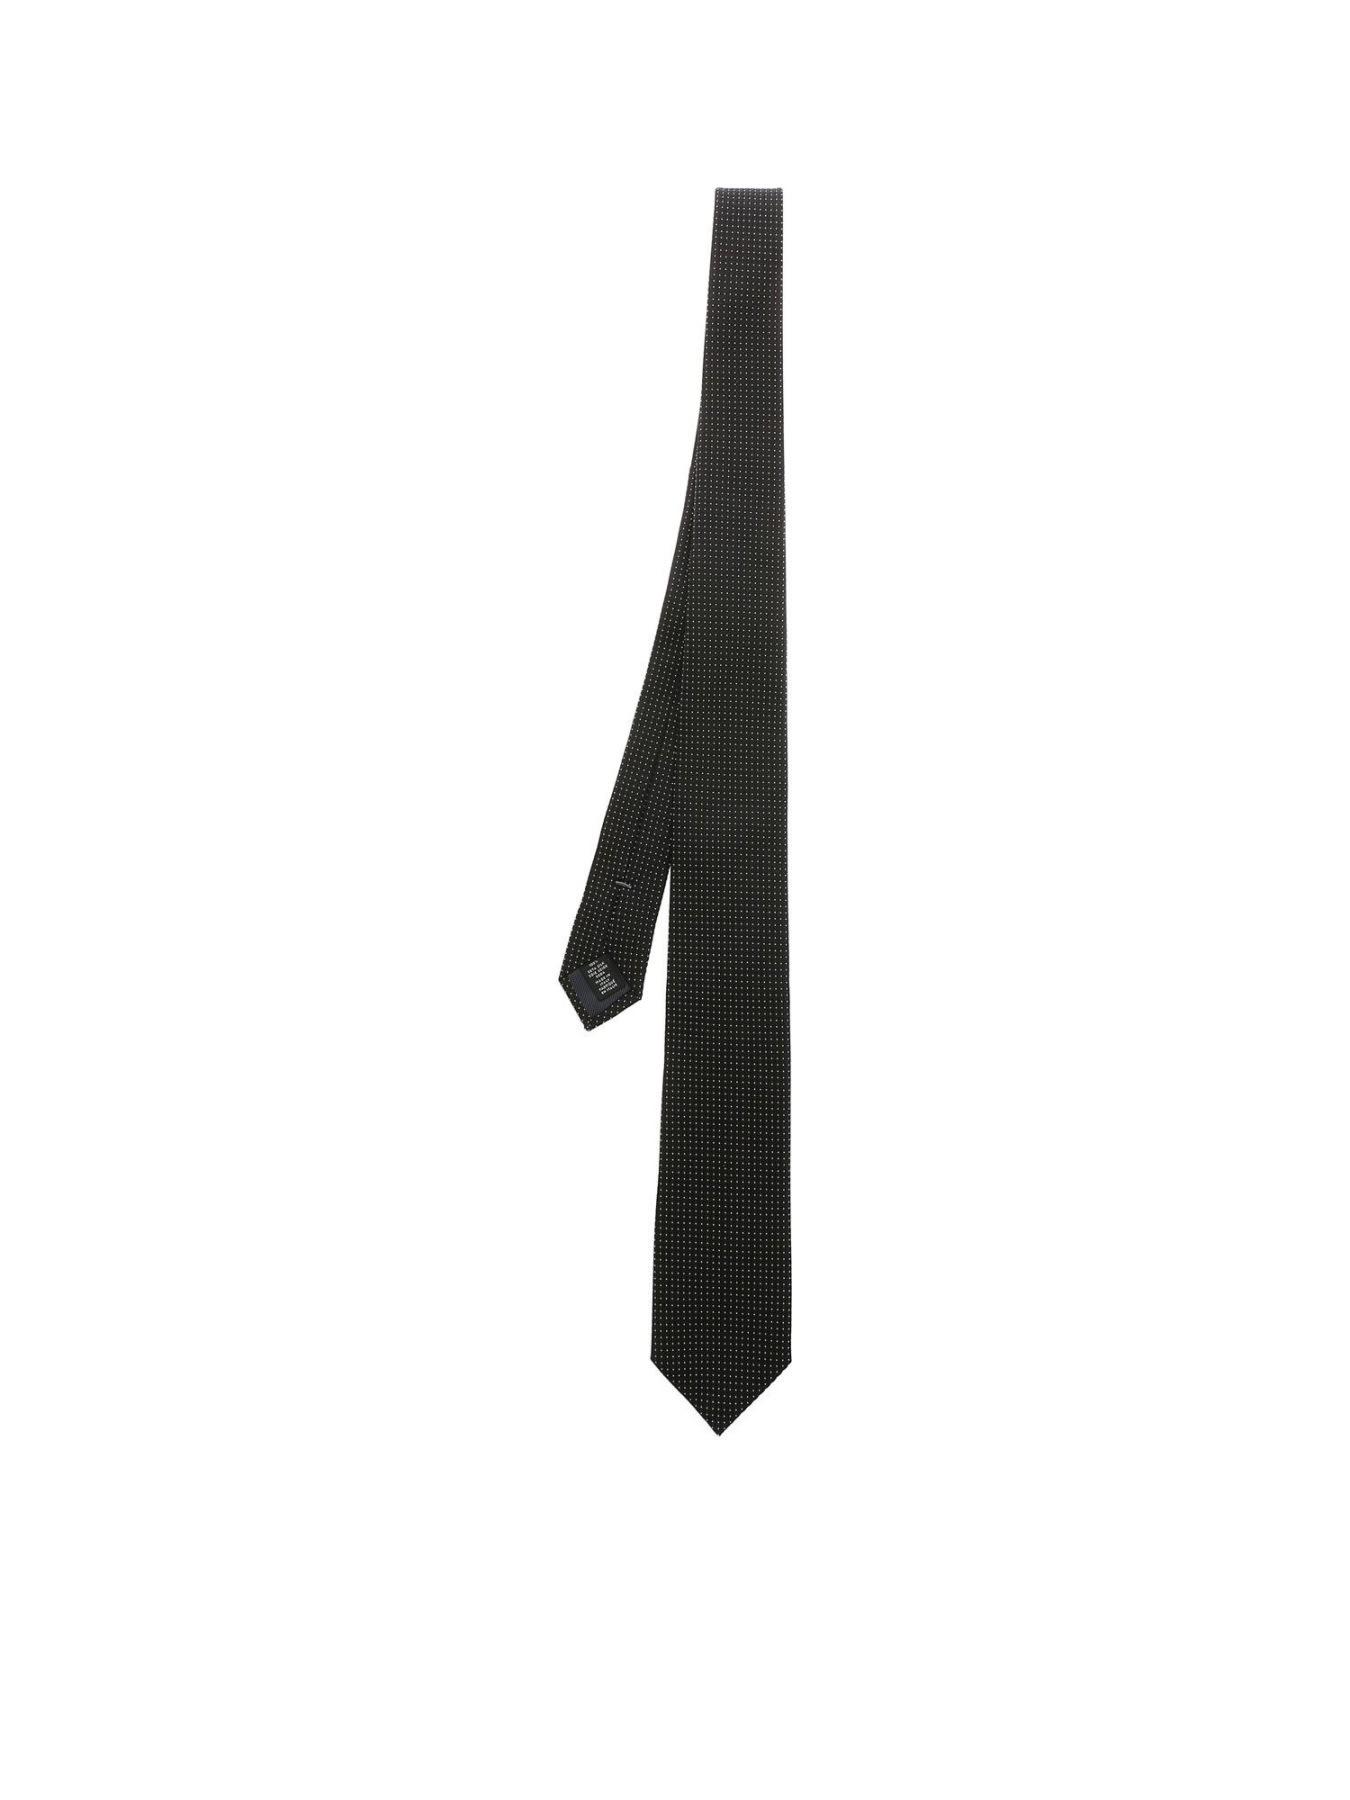 81f484ec63 Tie Silk